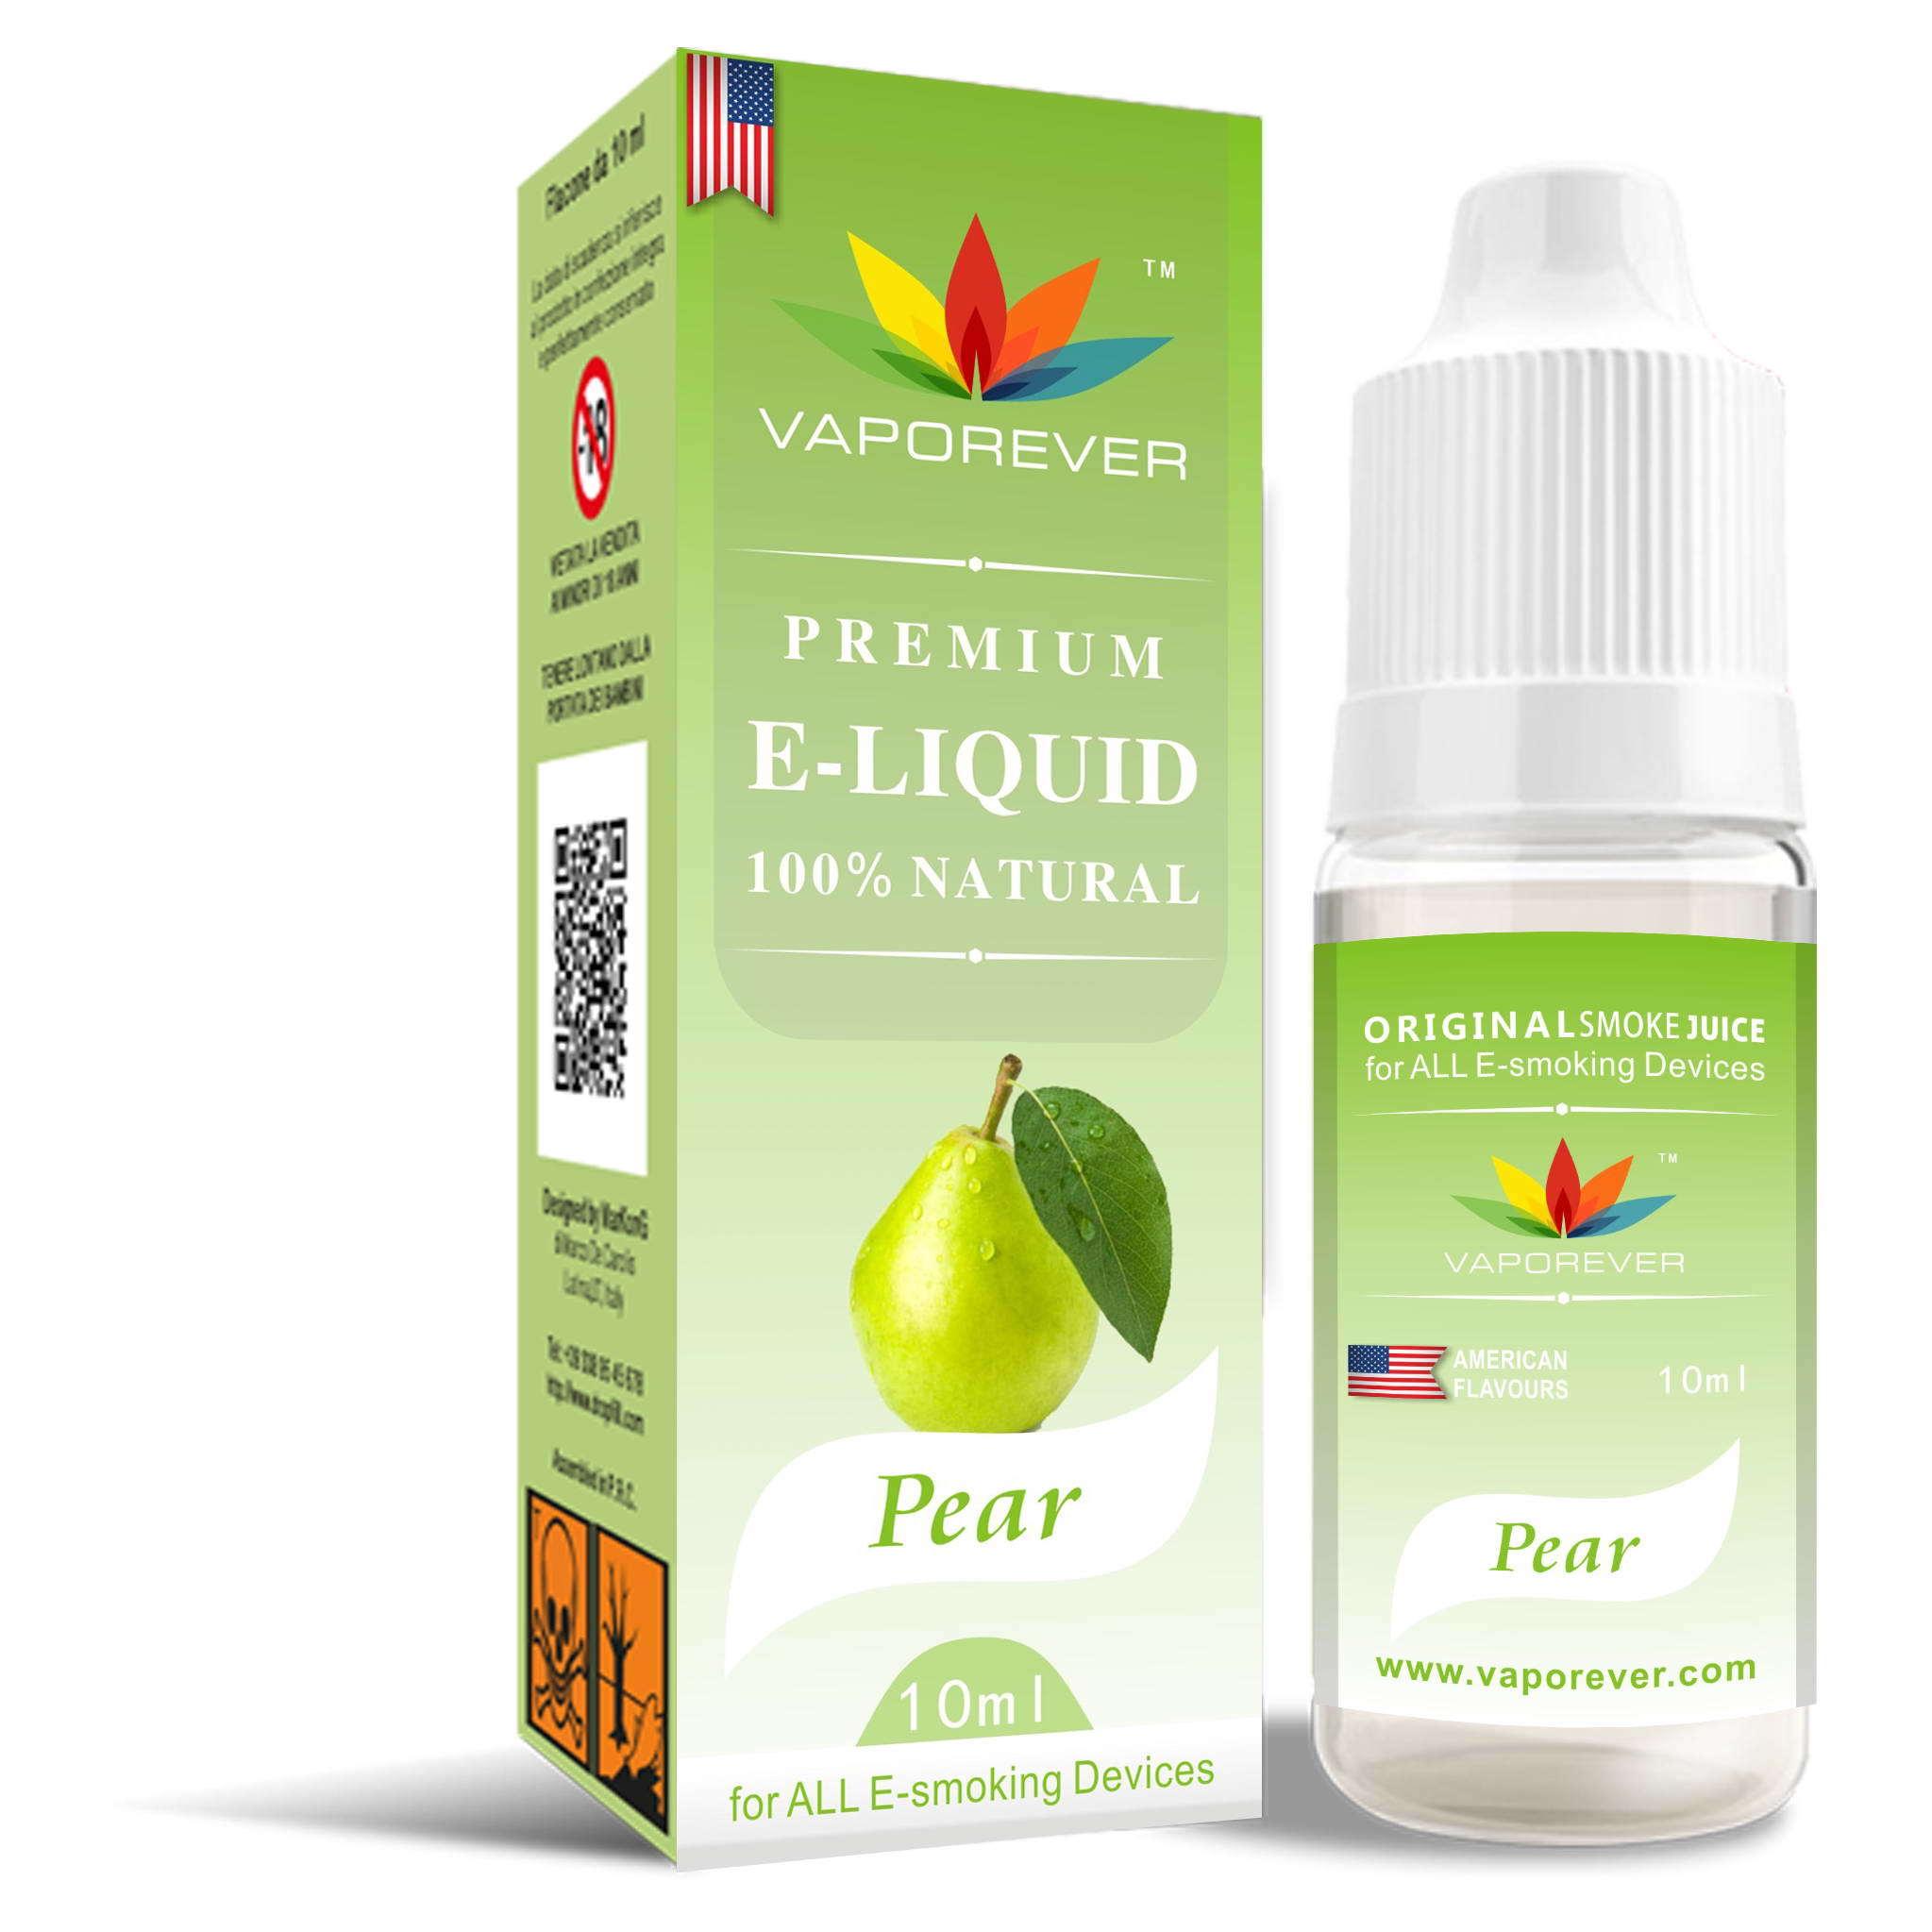 Pear Fruit Flavor Vapor Juice for E-Cig